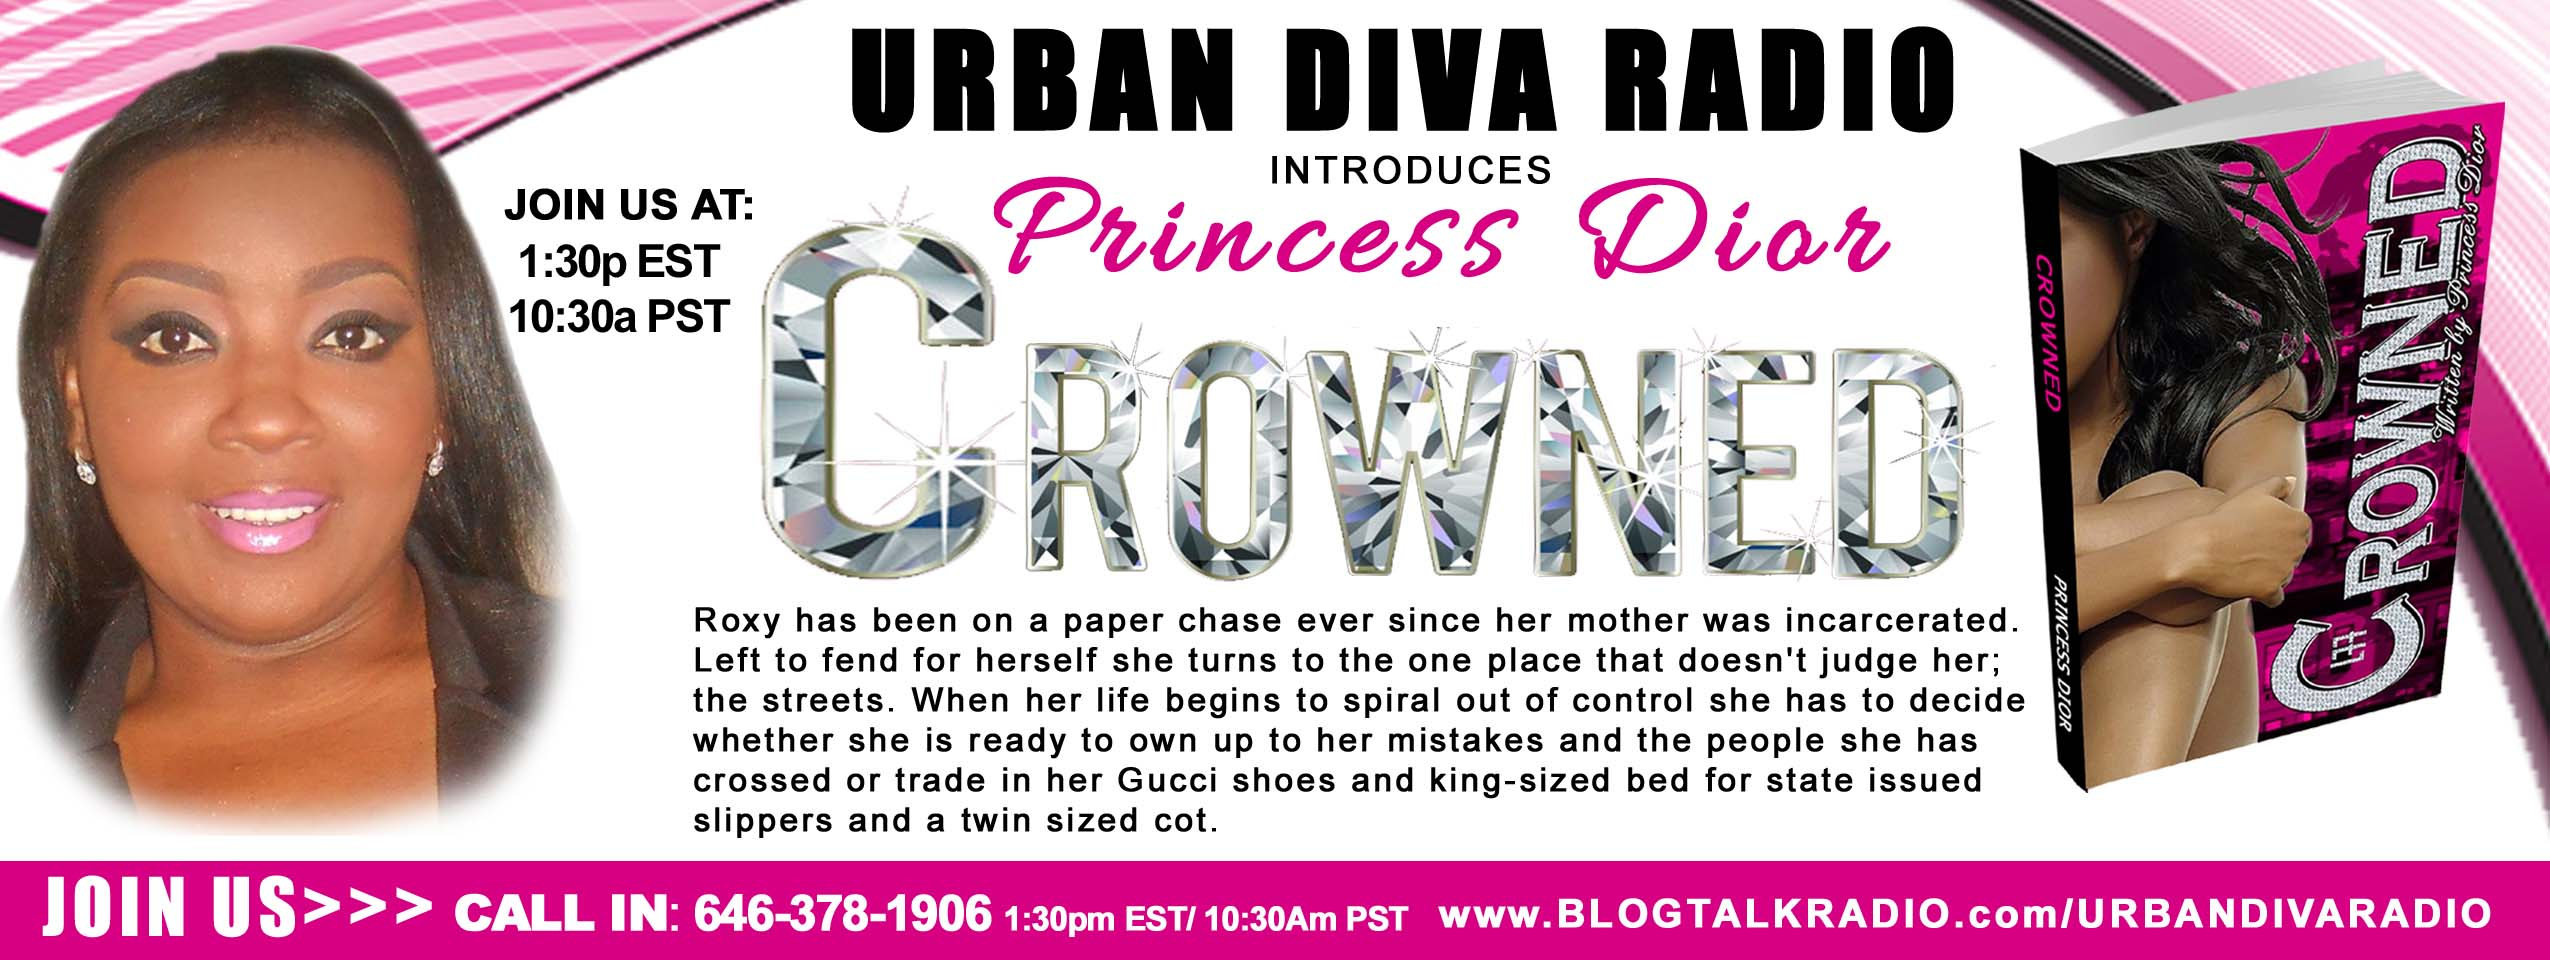 Urban Diva Radio